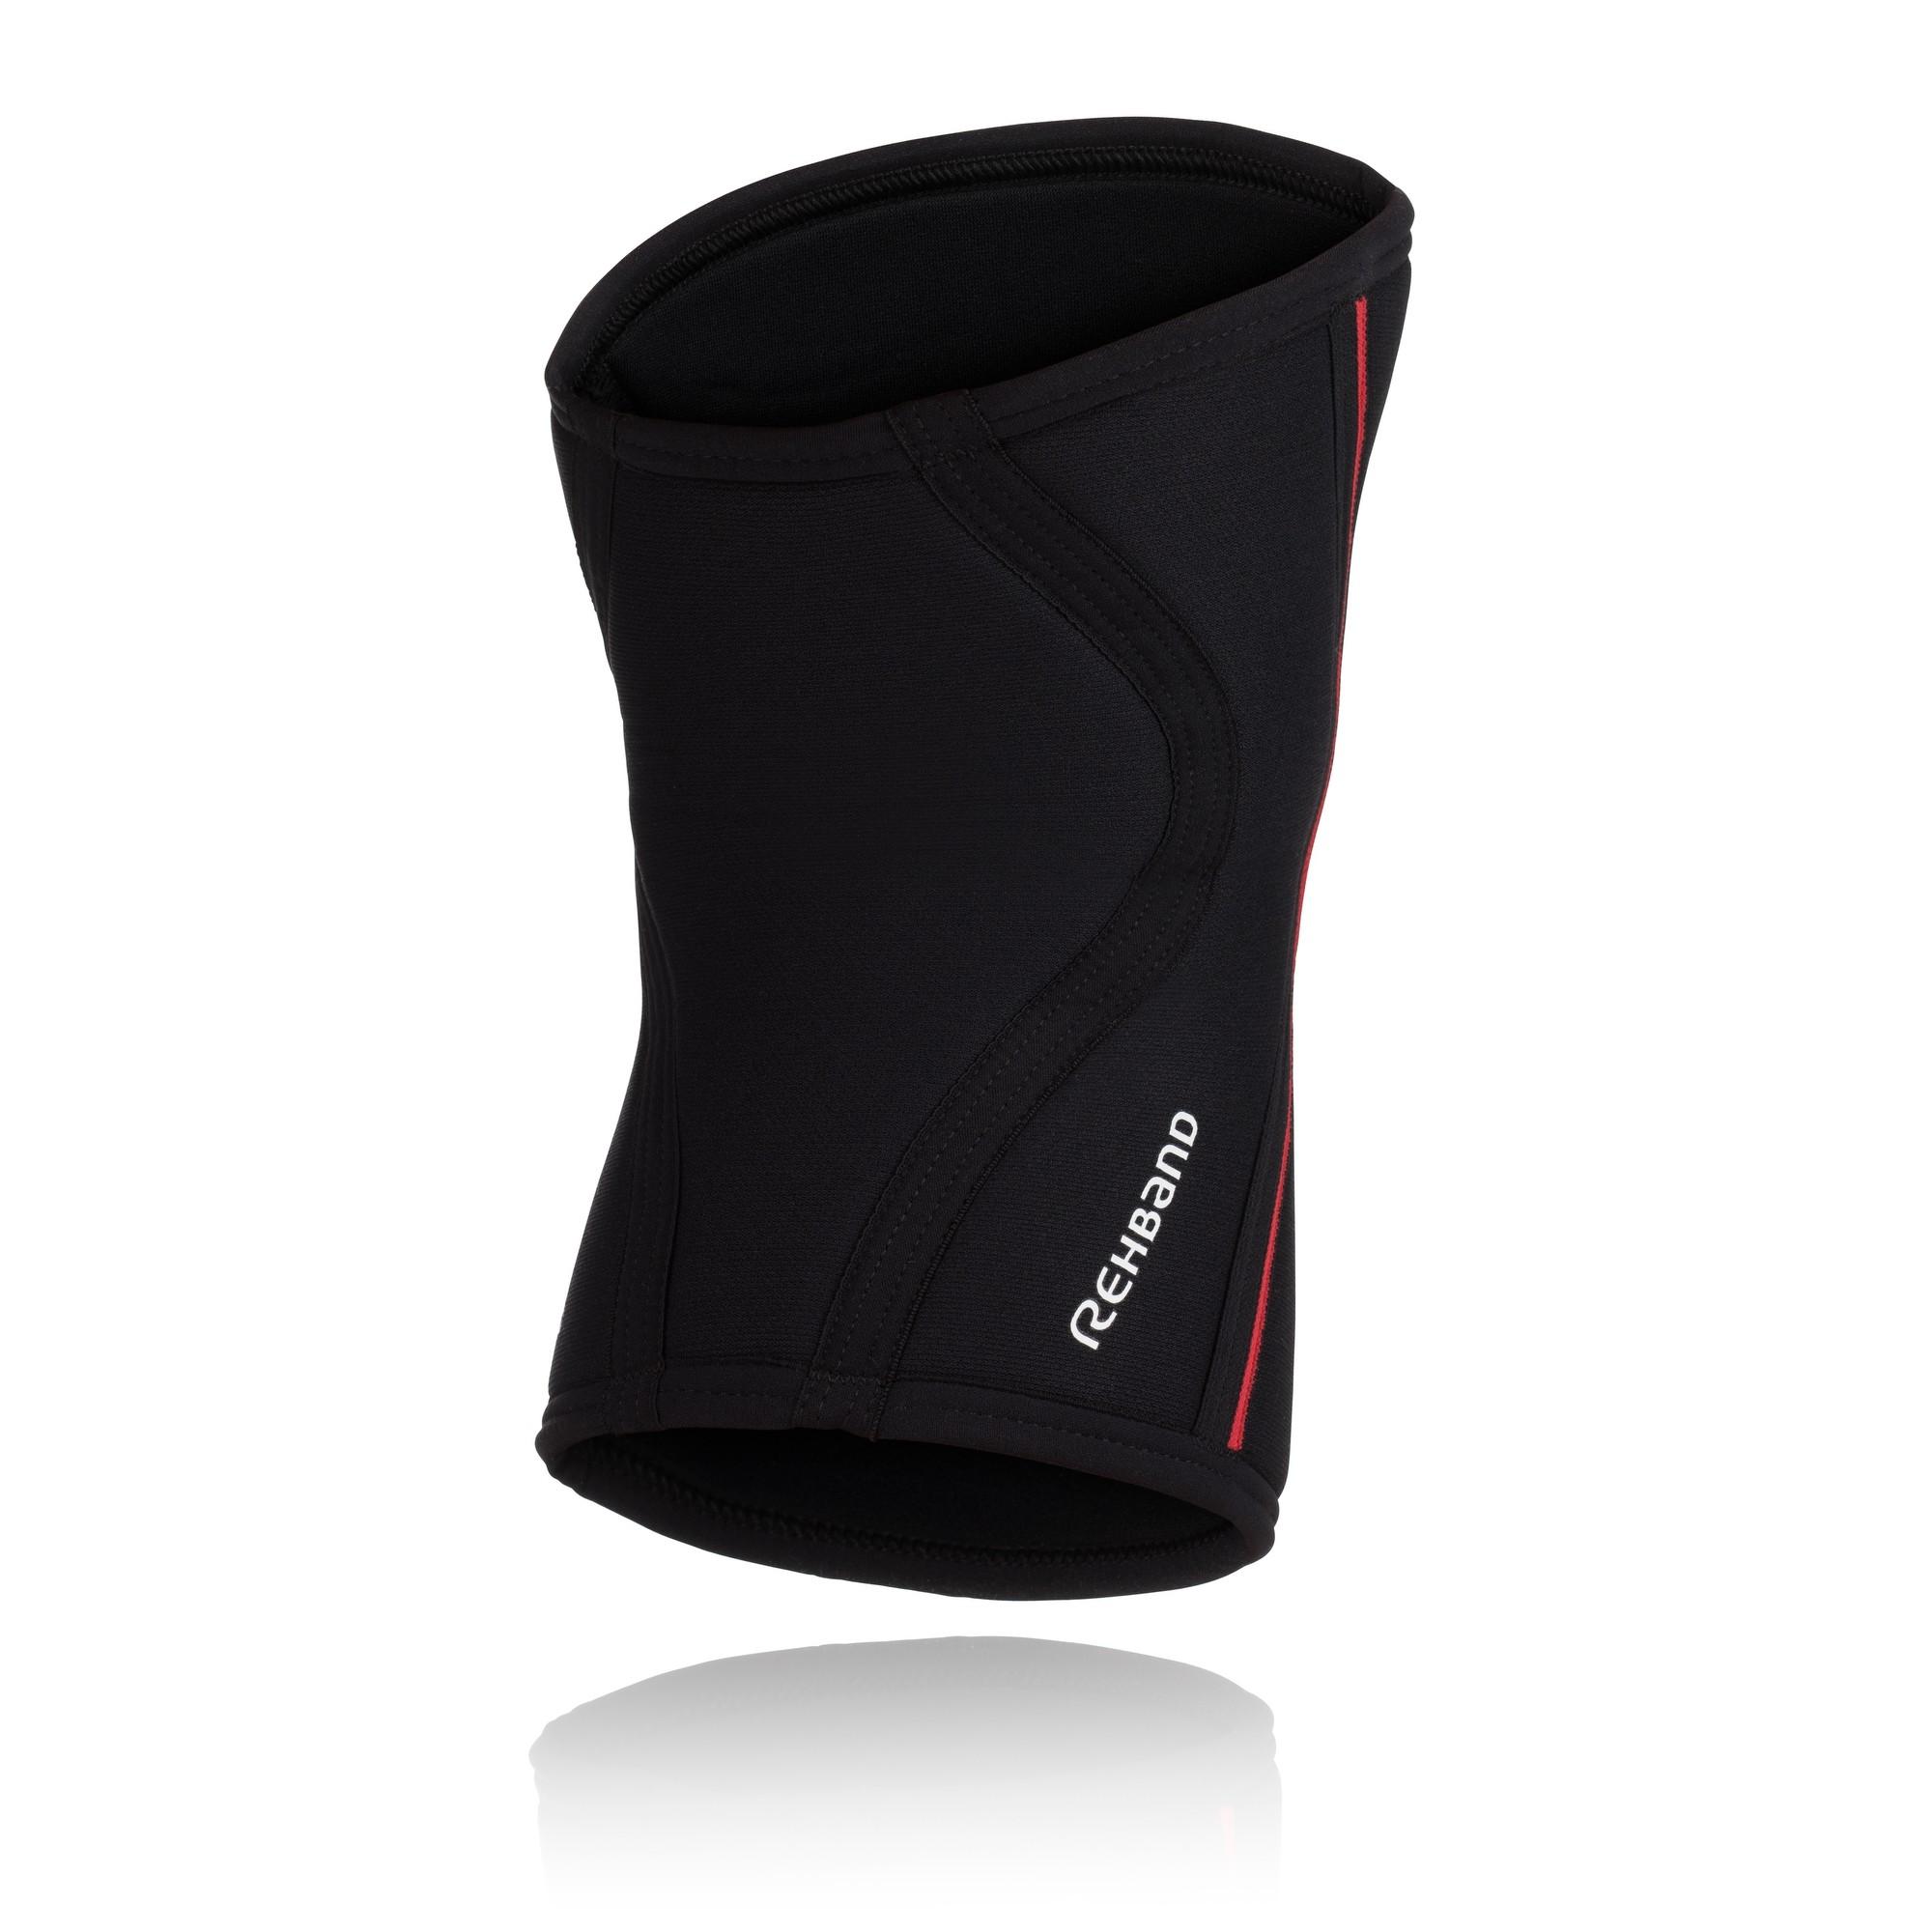 Rehband RX Kniebandage schwarz/rot 7mm